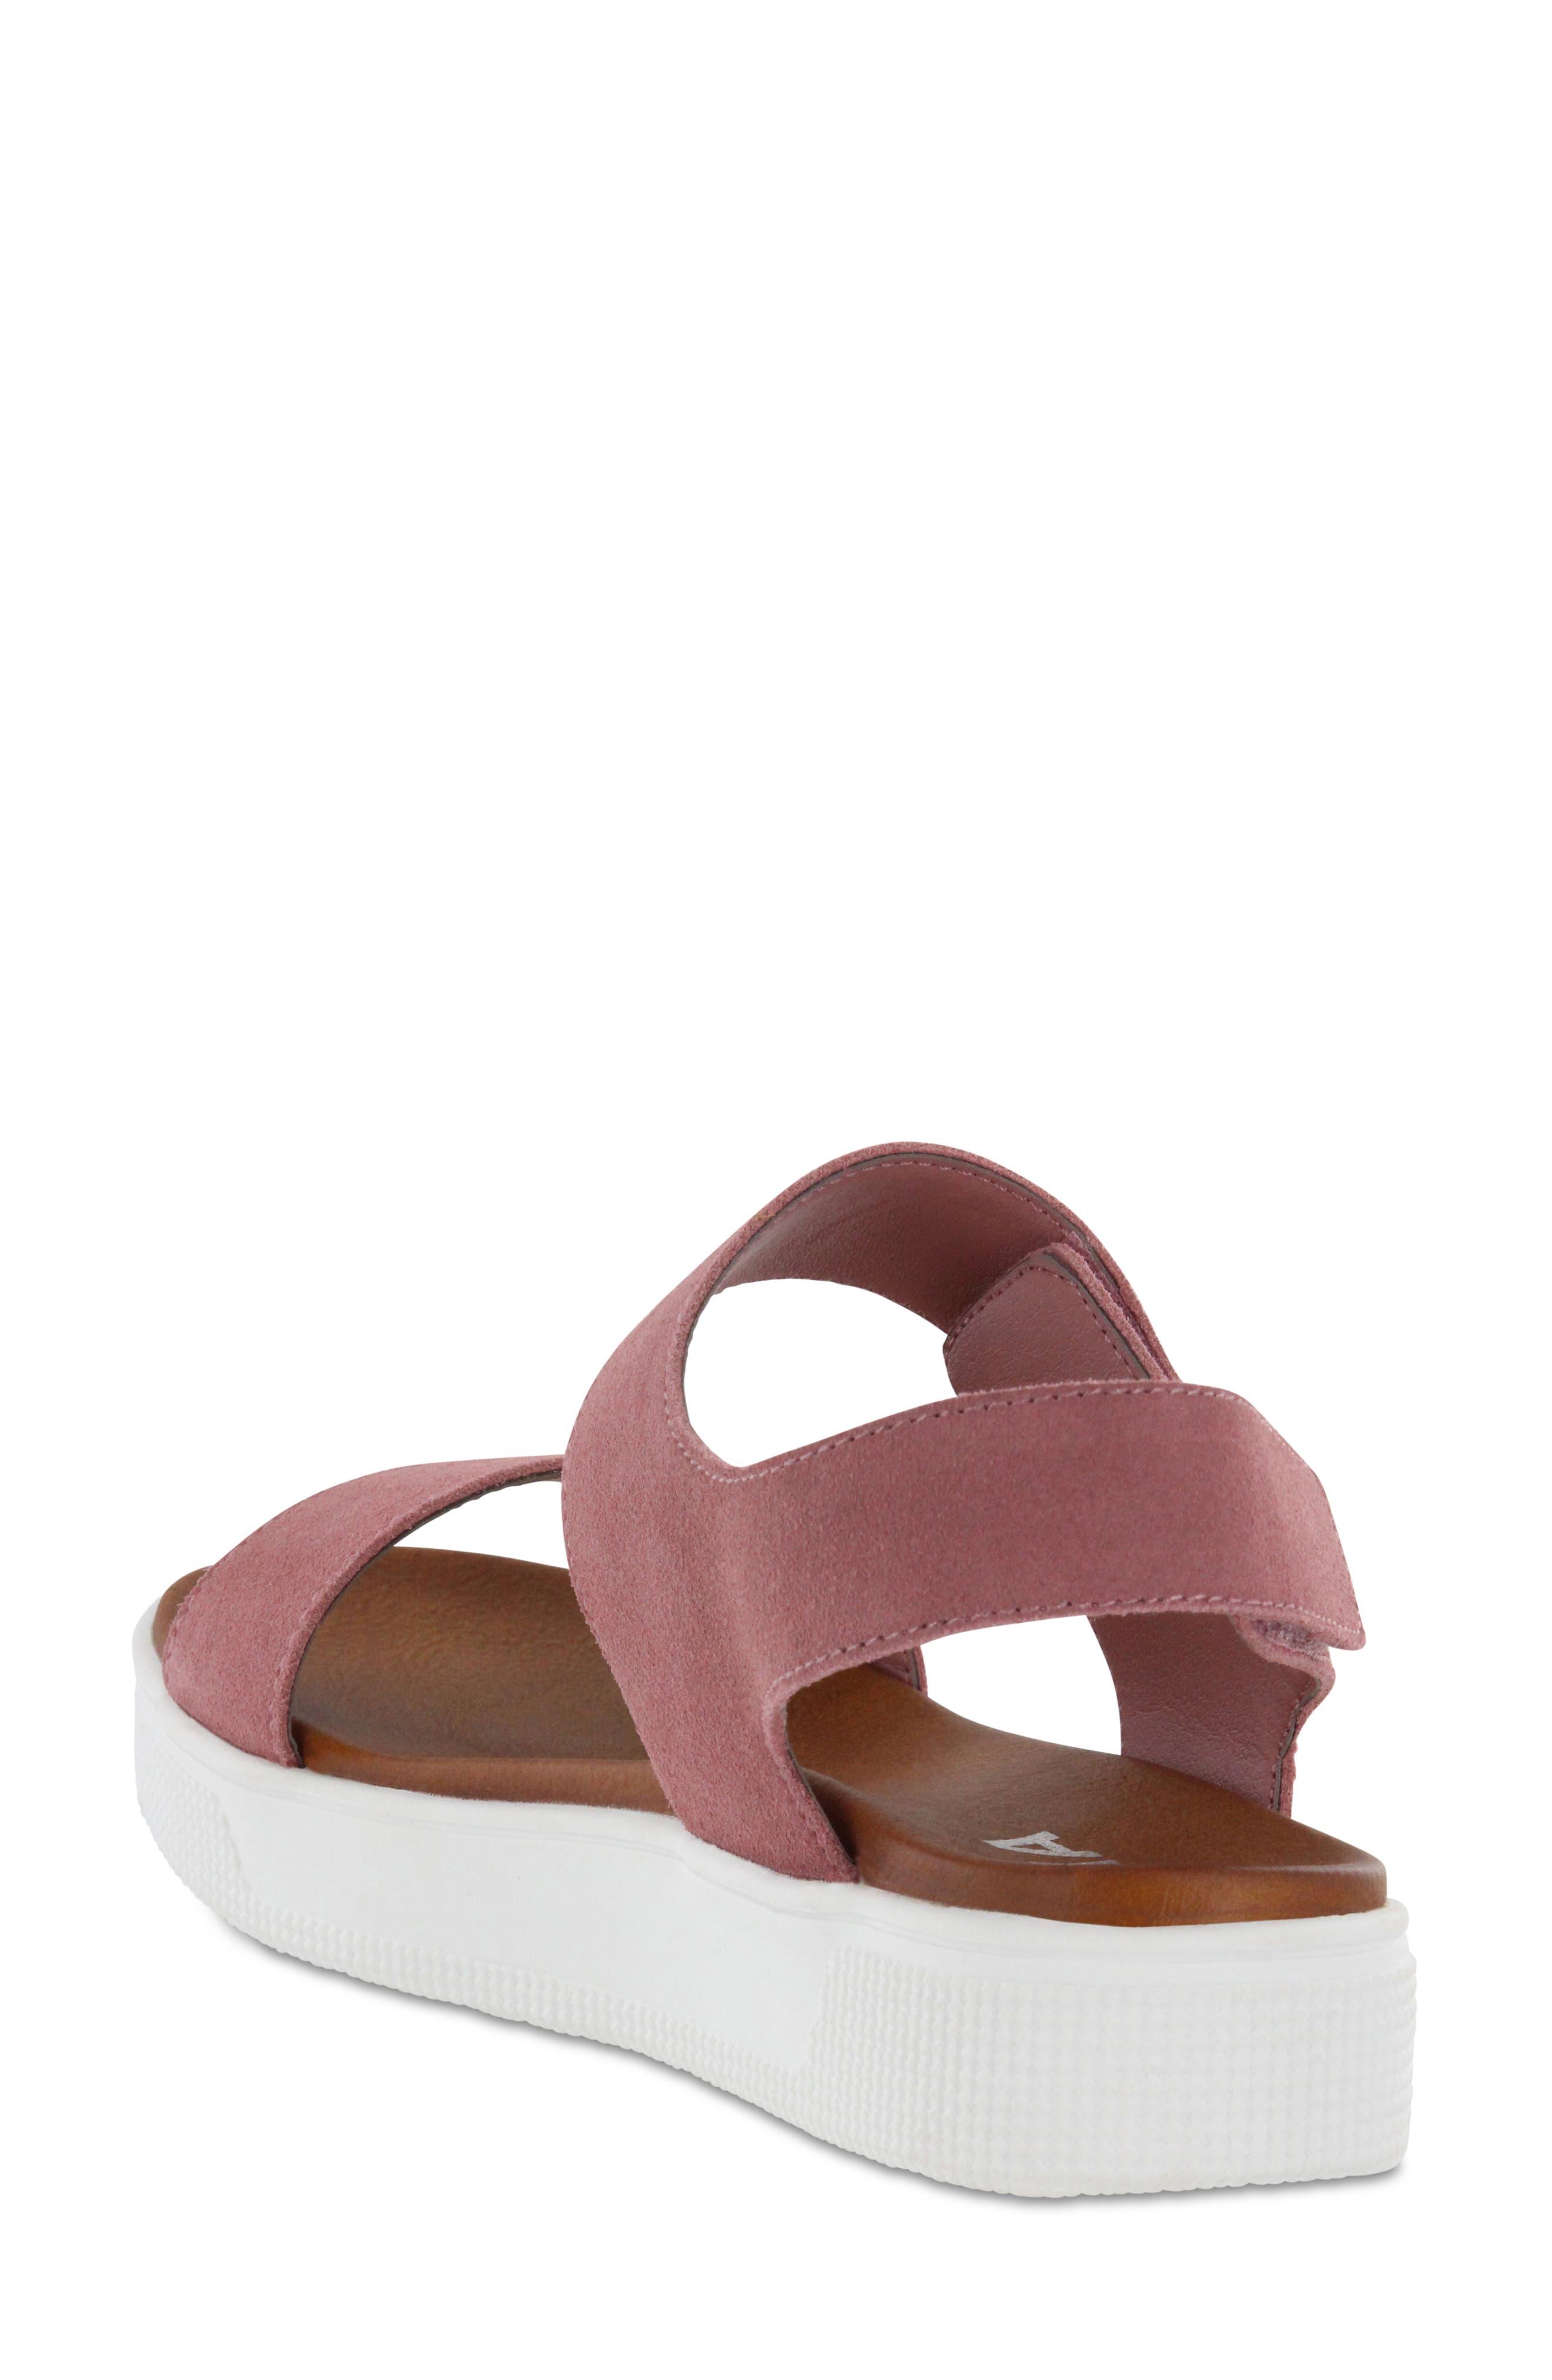 Troy Slingback Platform Sandal,                             Alternate thumbnail 2, color,                             Mauve Suede